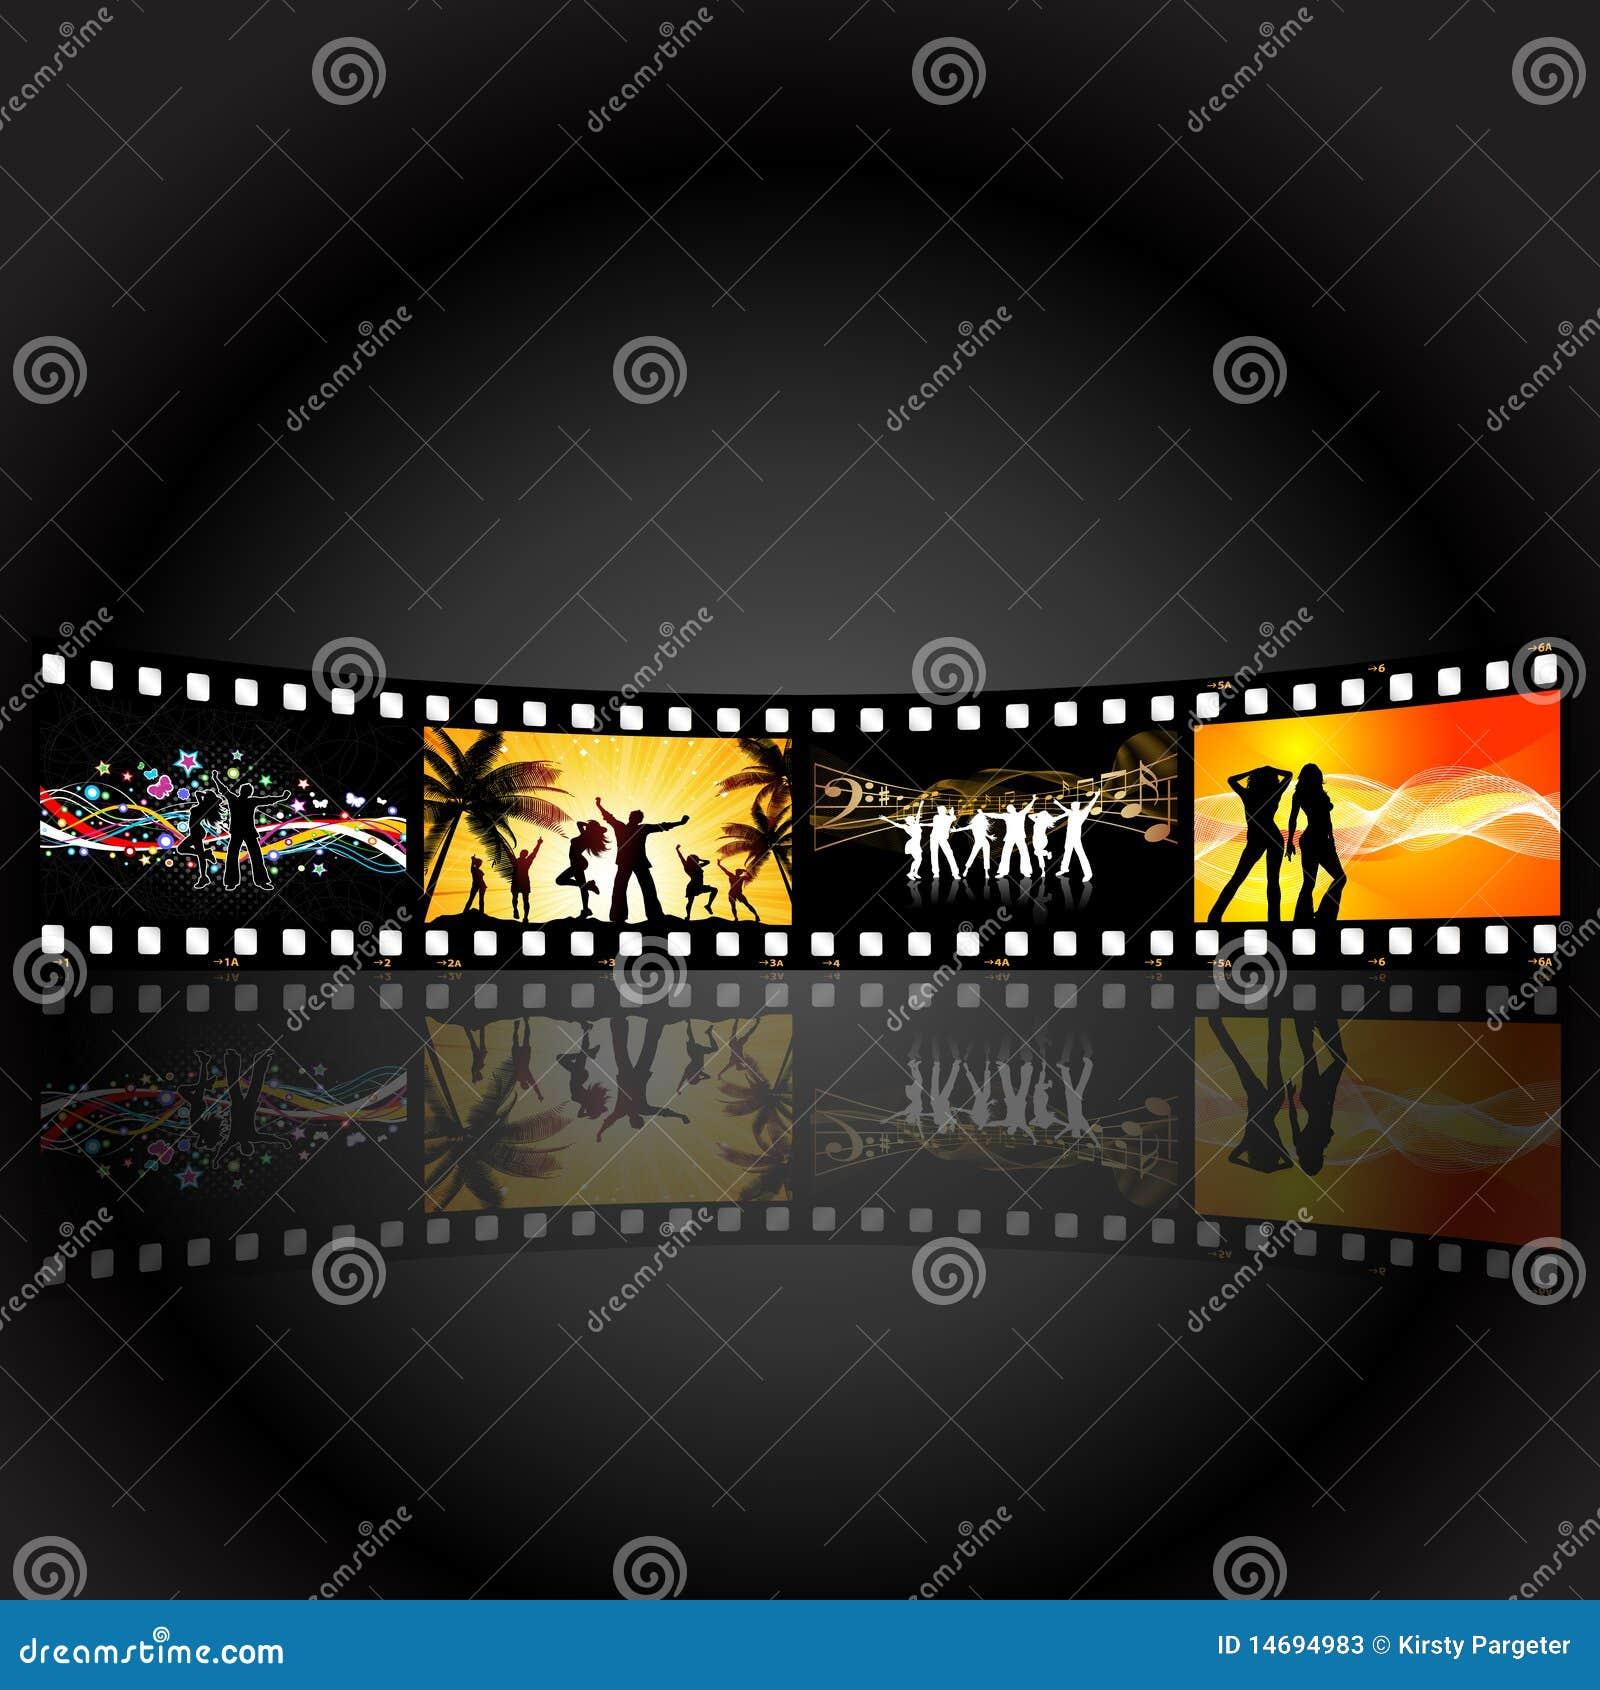 Film Strip Party People Stock Photos - Image: 14694983